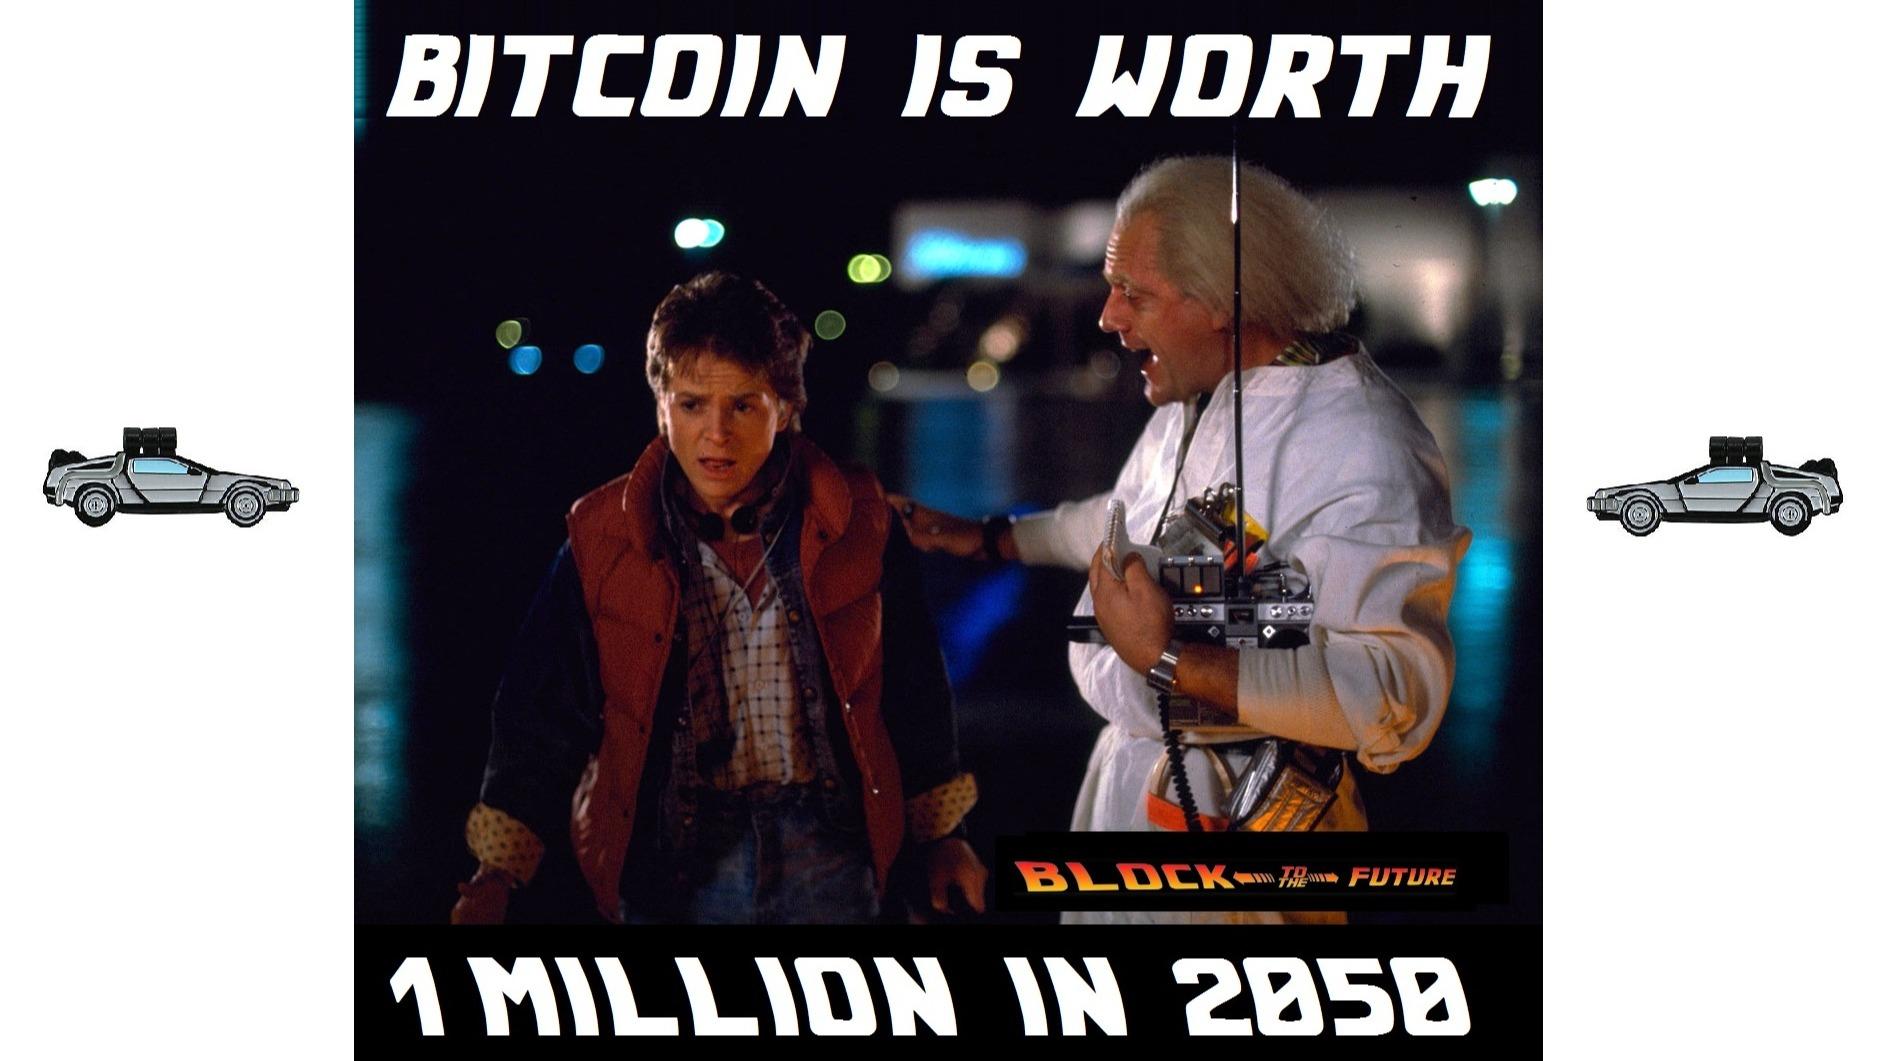 Bitcoin is worth 1 million in 2050